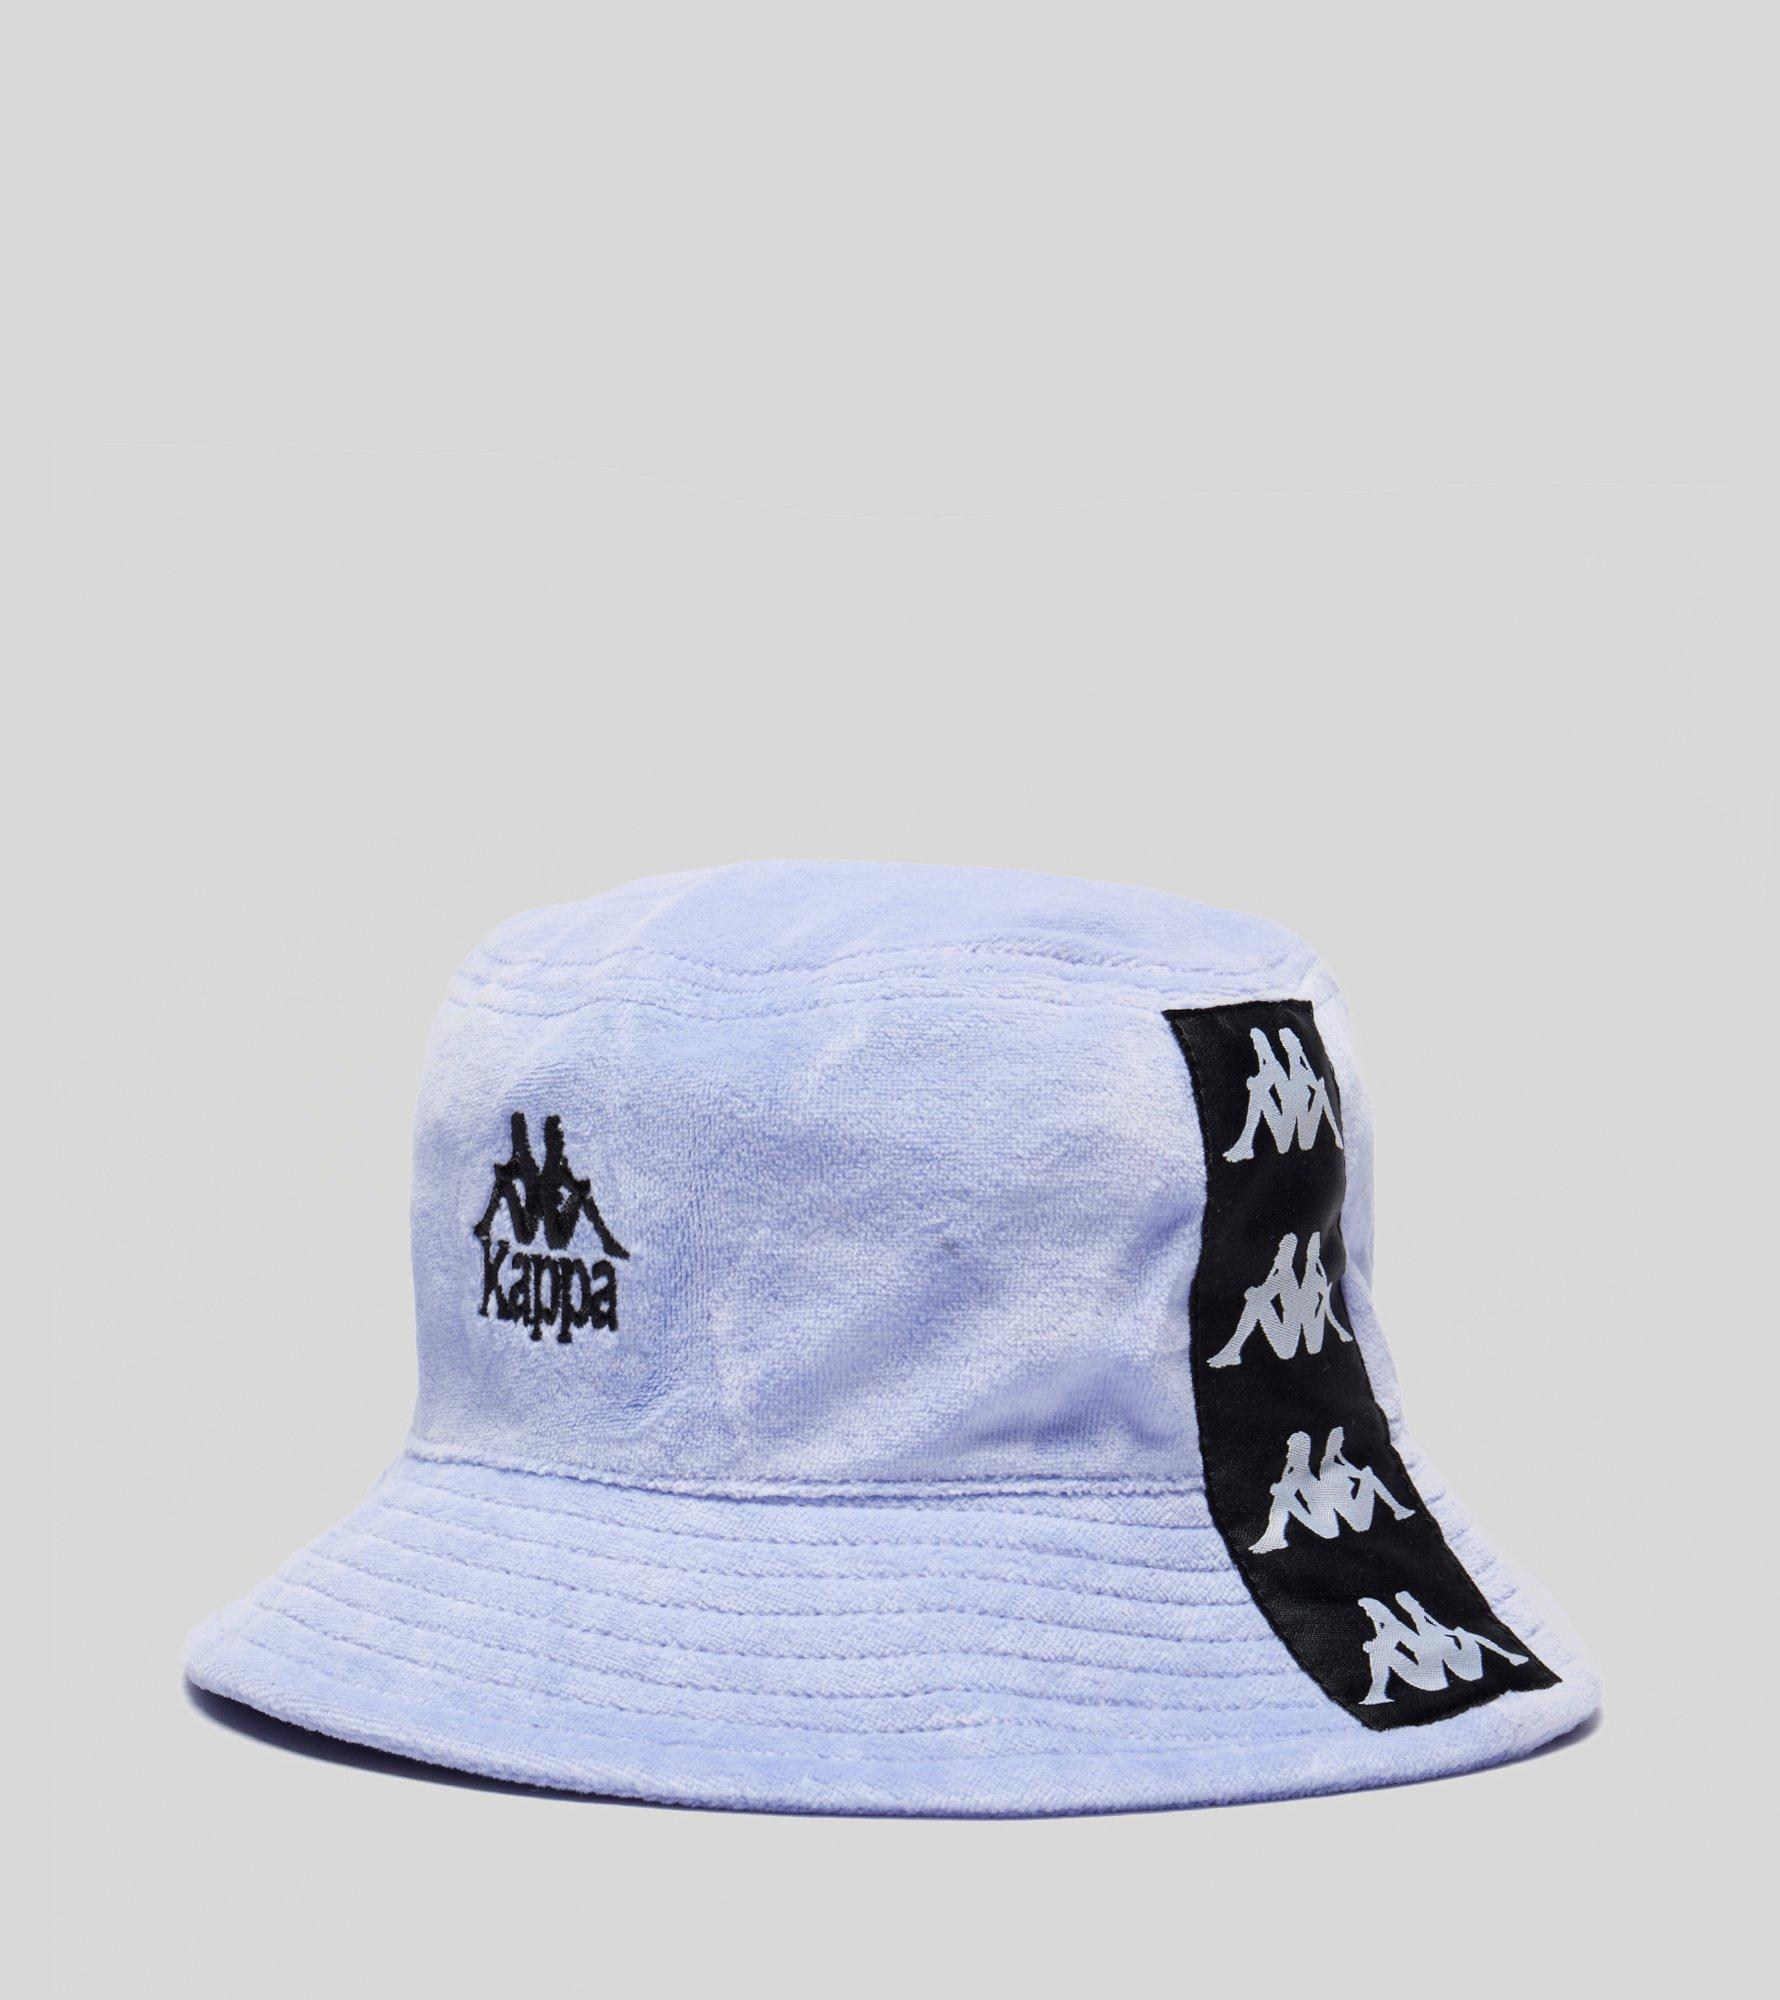 Lyst - Kappa Ayumen Bucket Hat in Blue for Men a5bc74a80d81